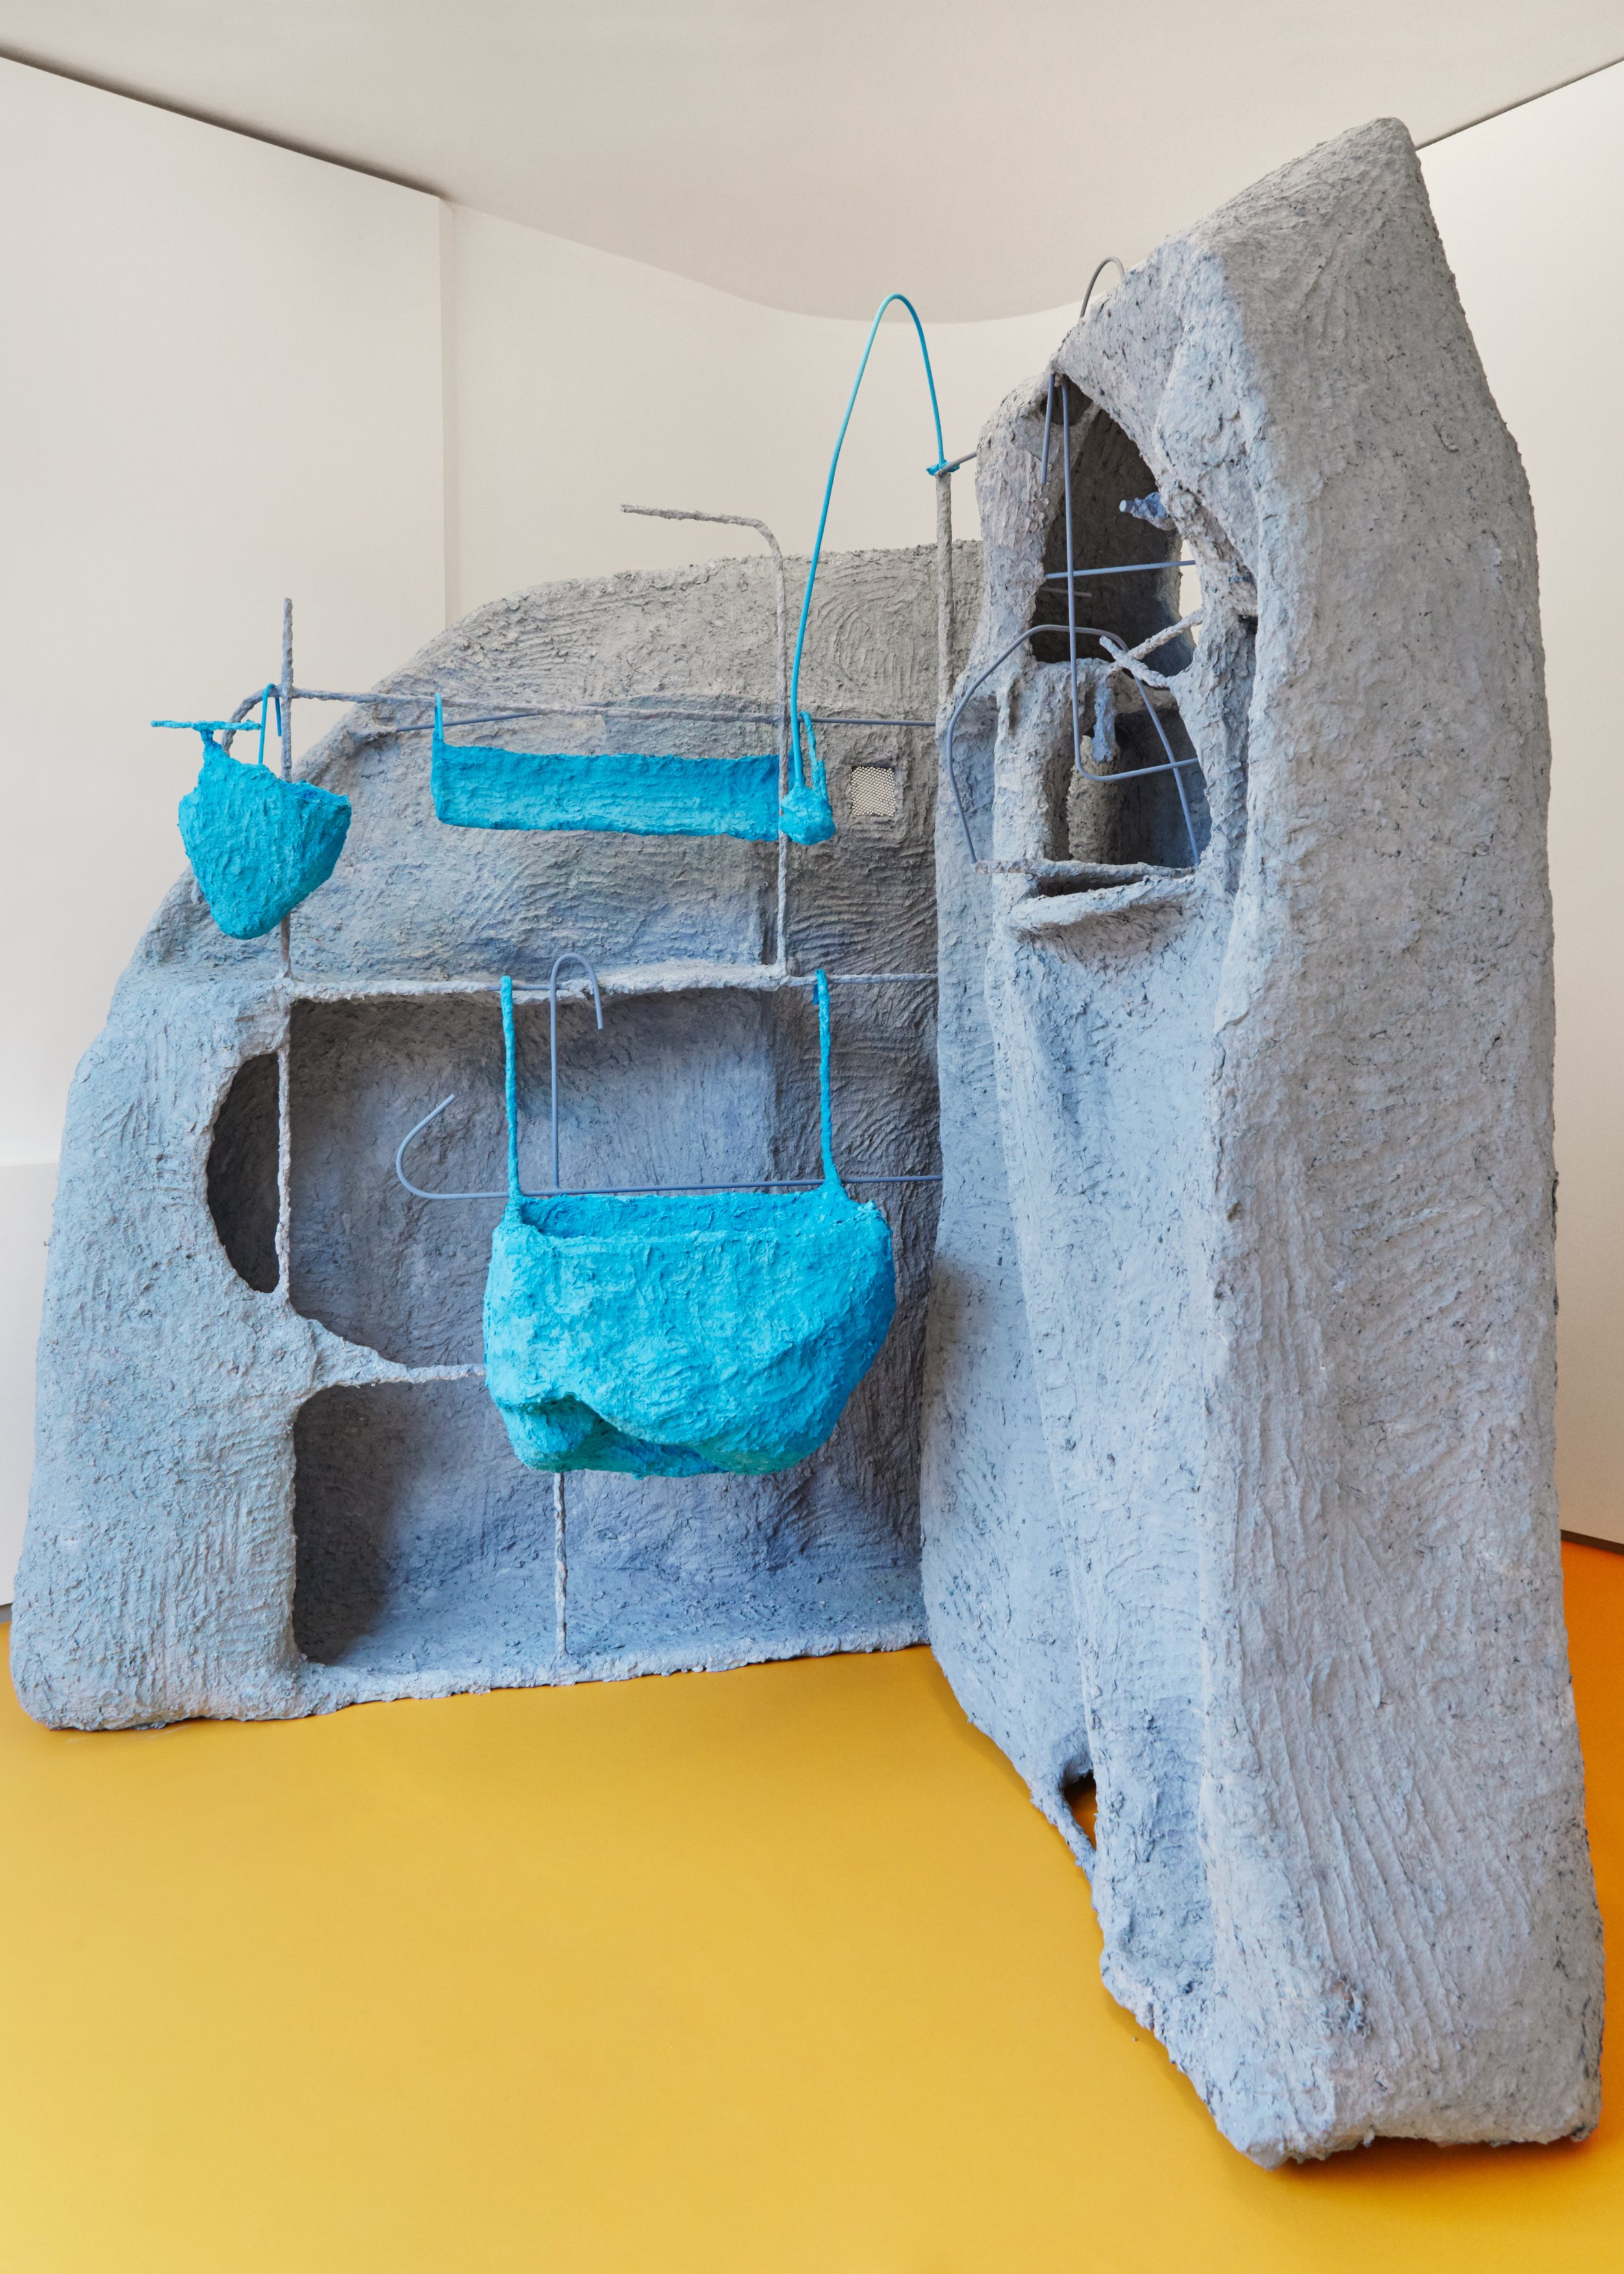 Roost, 2018  Steel, mesh, chicken wire, newspapers, glue, plaster, paint  228 x 170 x 160 cm